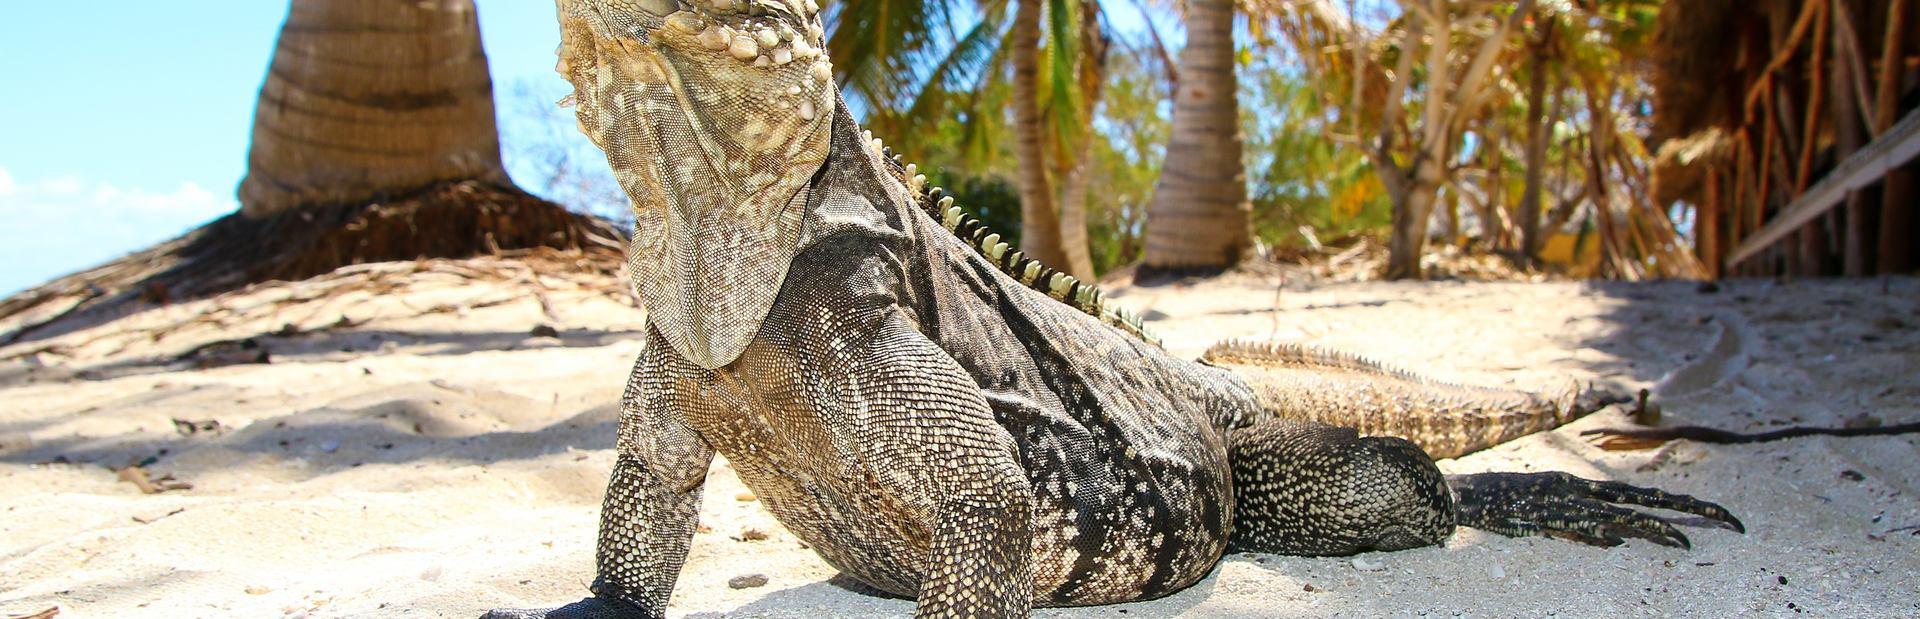 Iguana Beach Image 1